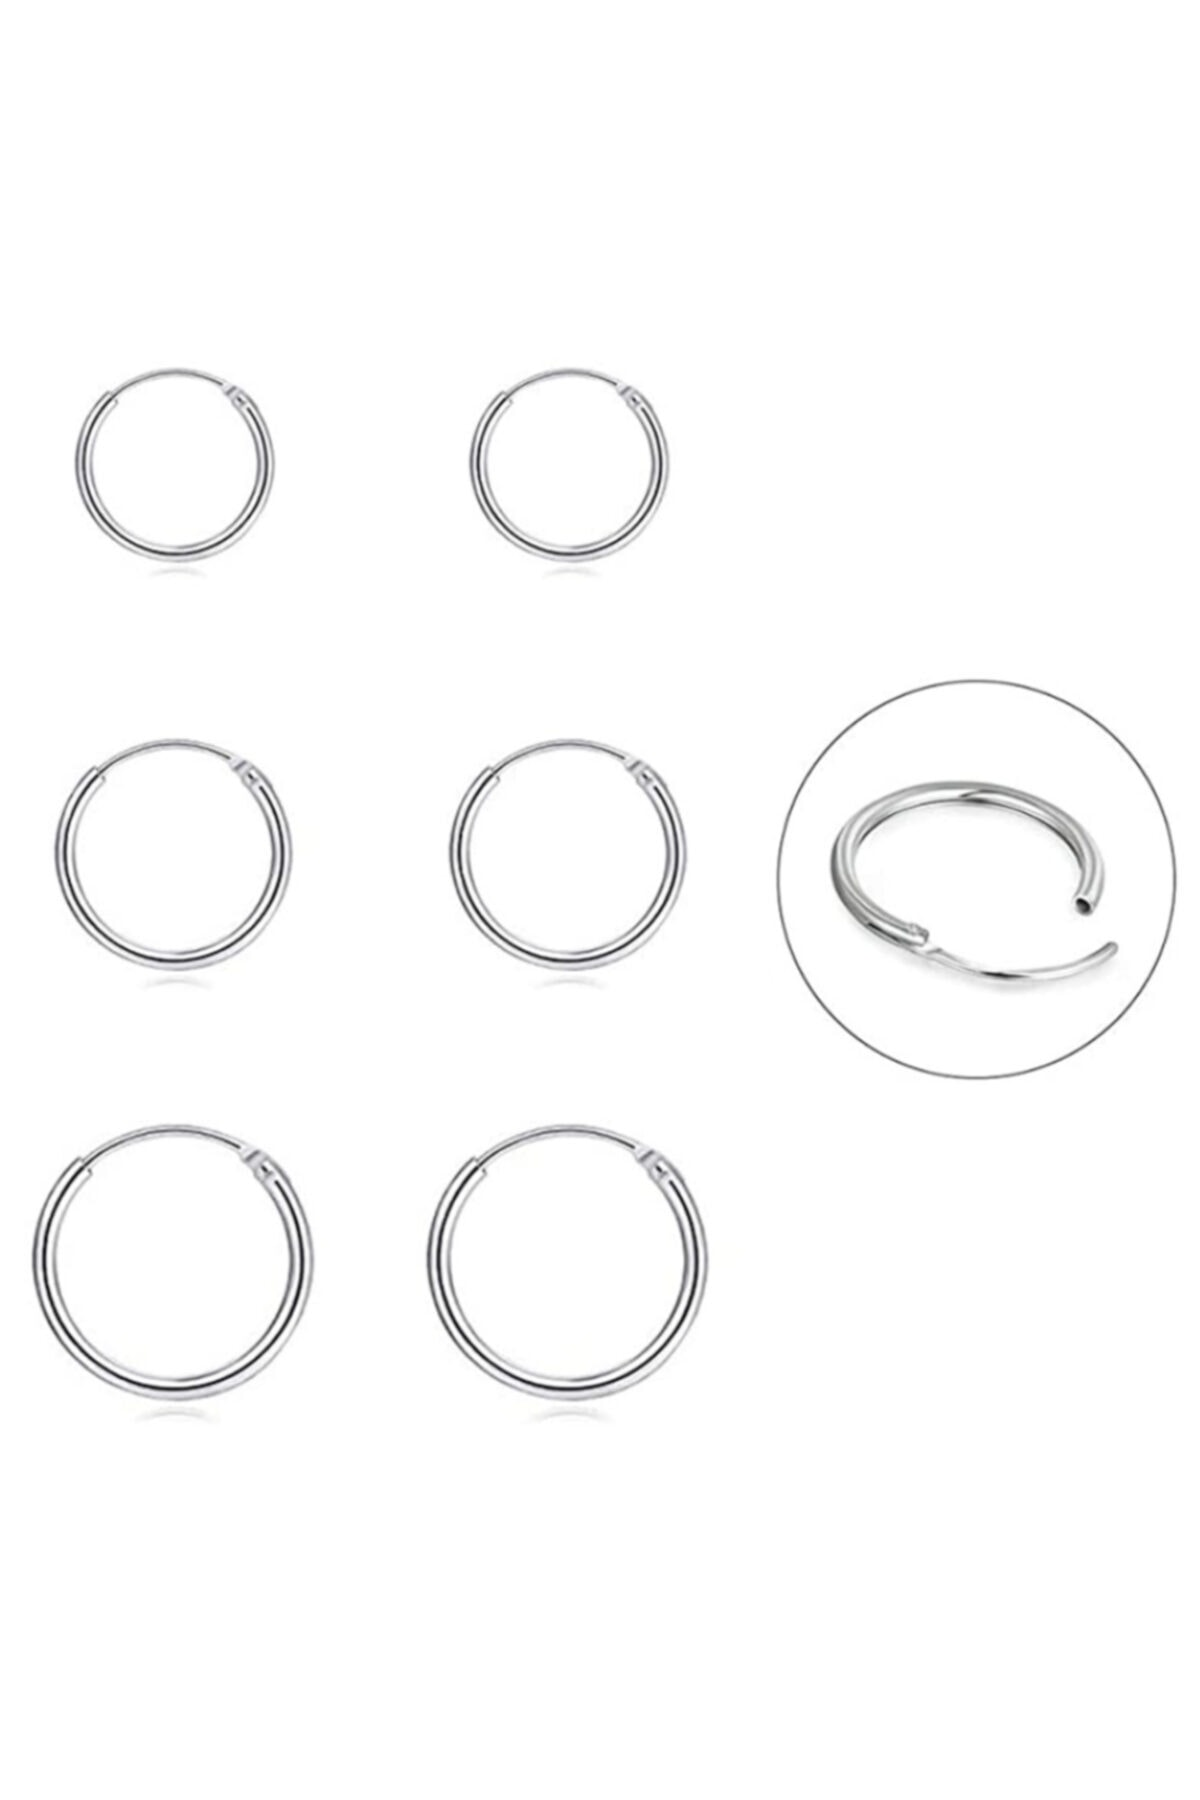 Onur Silver 925 Ayar Saf Gümüş Halka Küpe Seti 3'lü Hoop Earing Complete 12-14-16 Mm 1